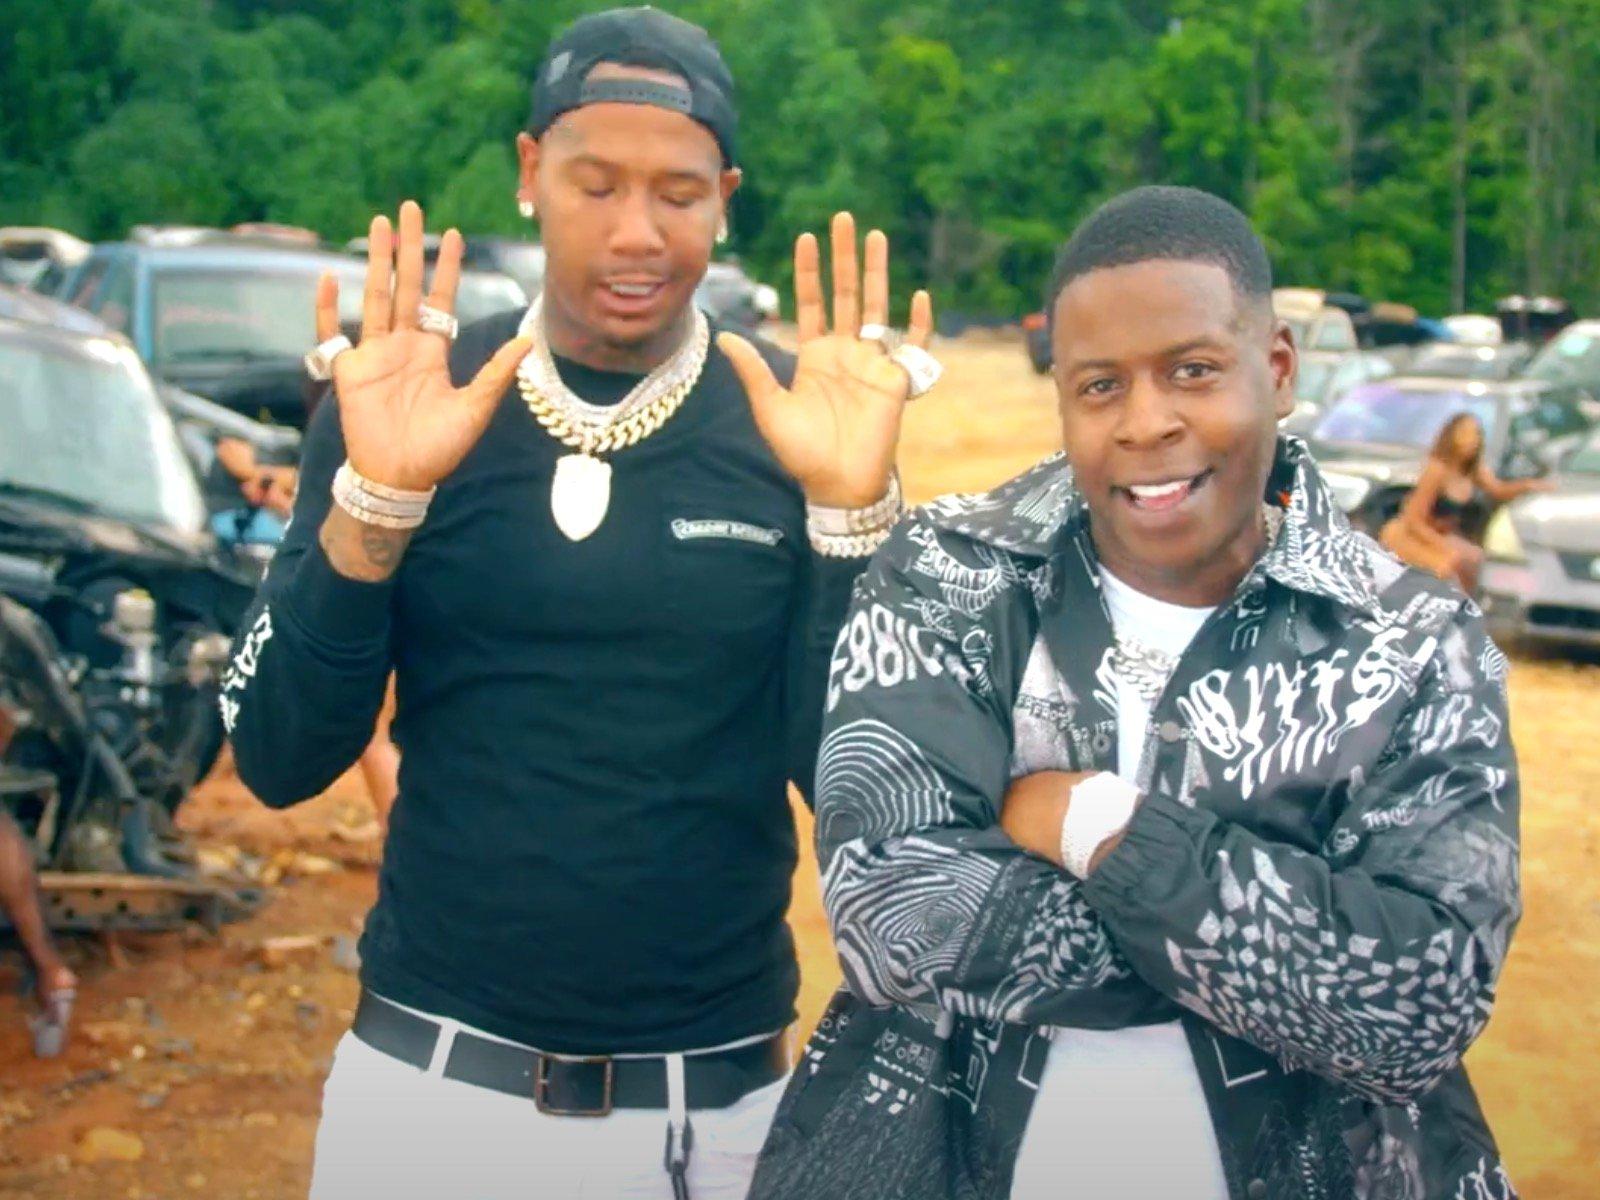 Moneybagg Yo + Blac Youngsta Turn Junkyard Into Party In Trickin A** N***a Video 7